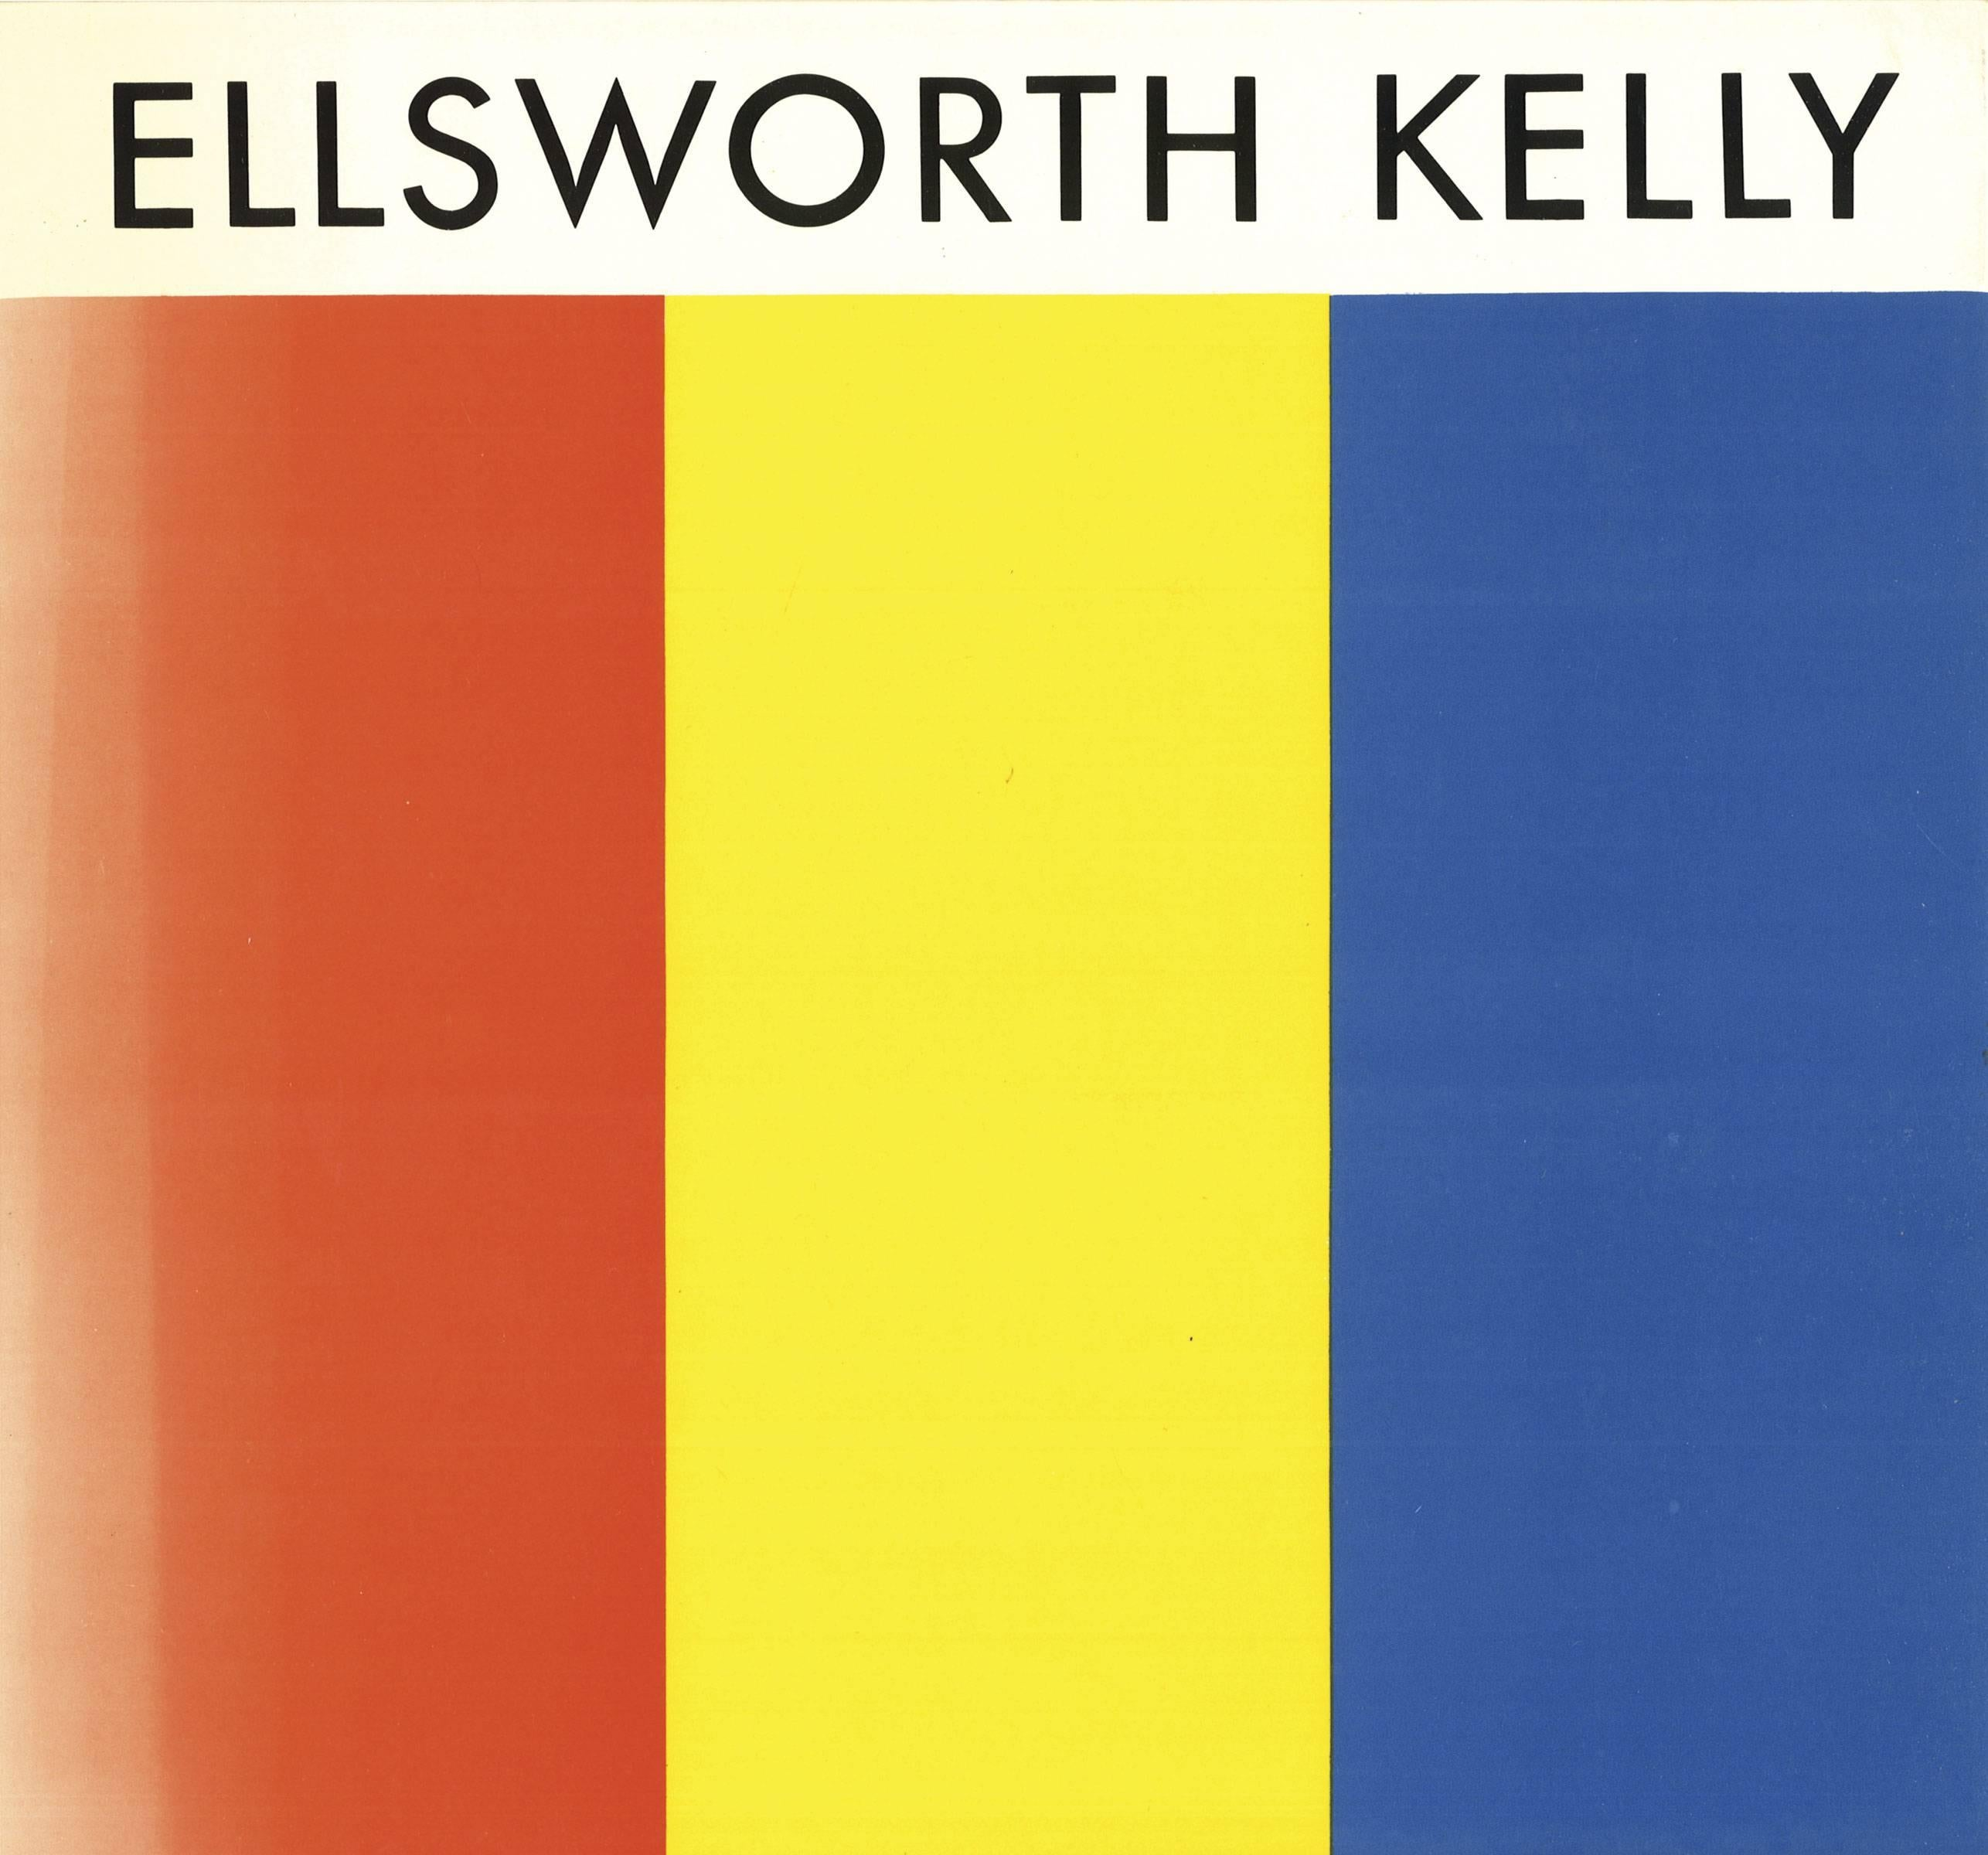 Ellsworth Kelly - ELLSWORTH KELLY [SIGNED], Painting For Sale at 1stdibs